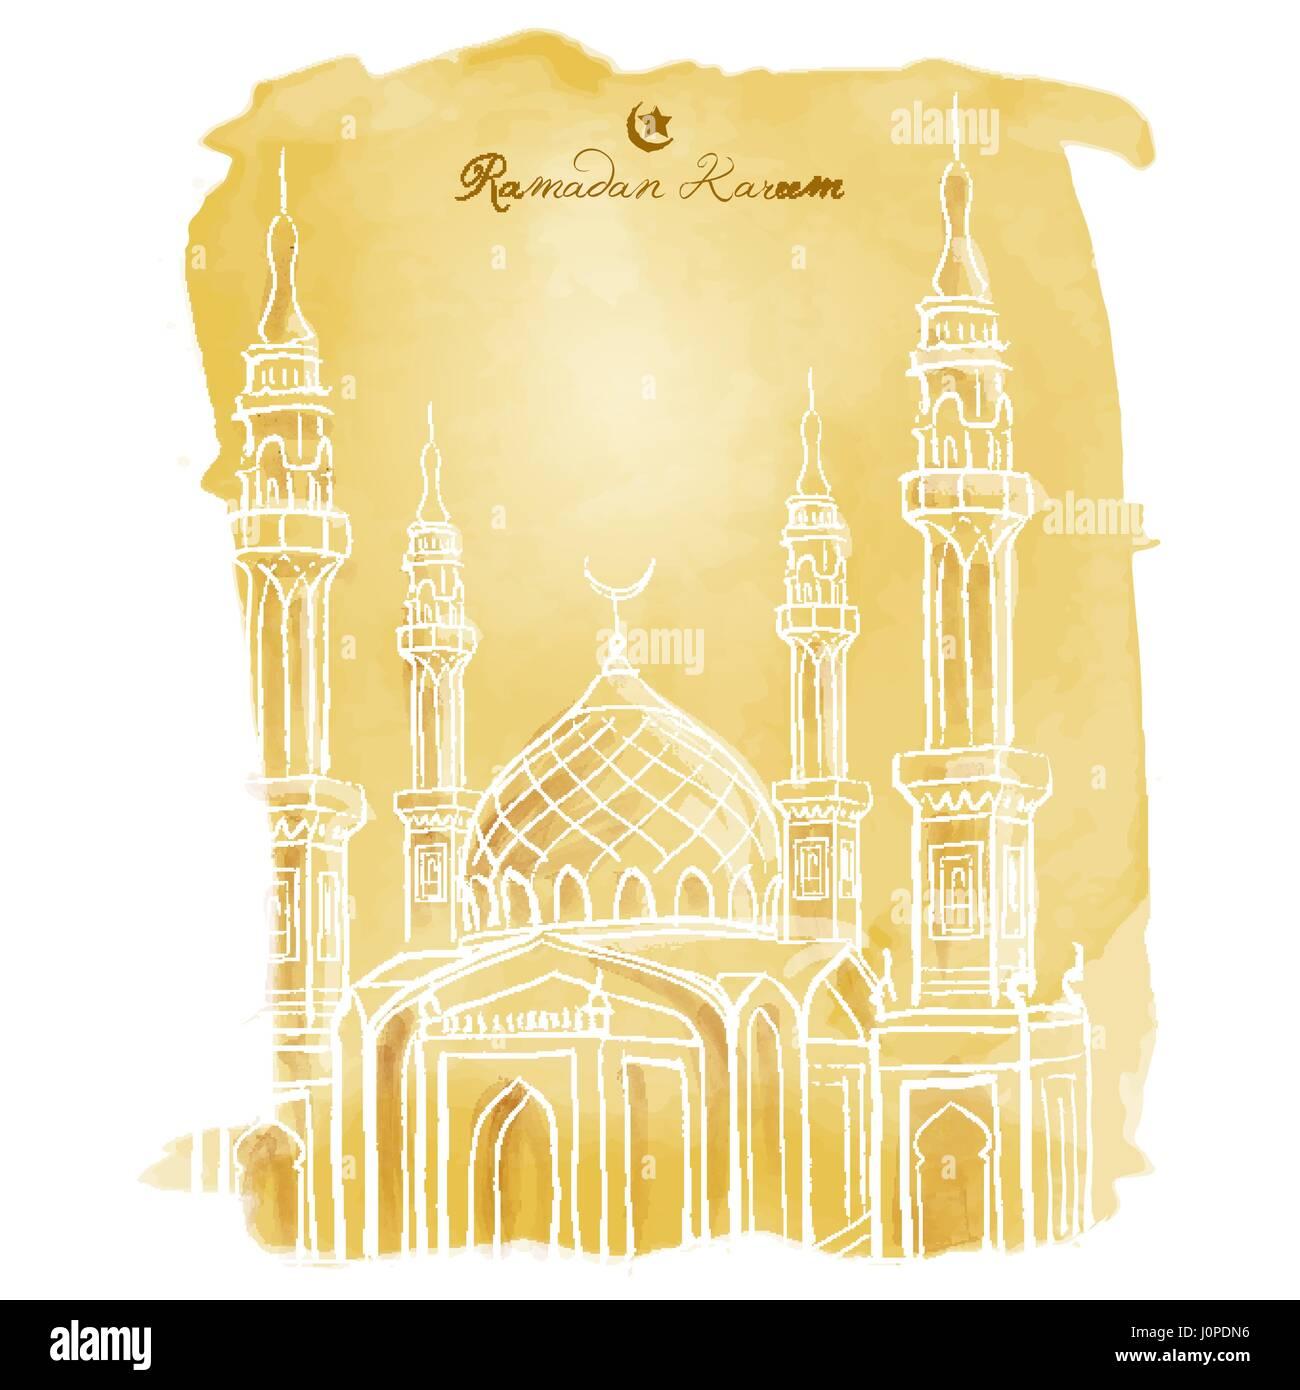 Ramadan kareem background islamic greeting template stock vector art ramadan kareem background islamic greeting template m4hsunfo